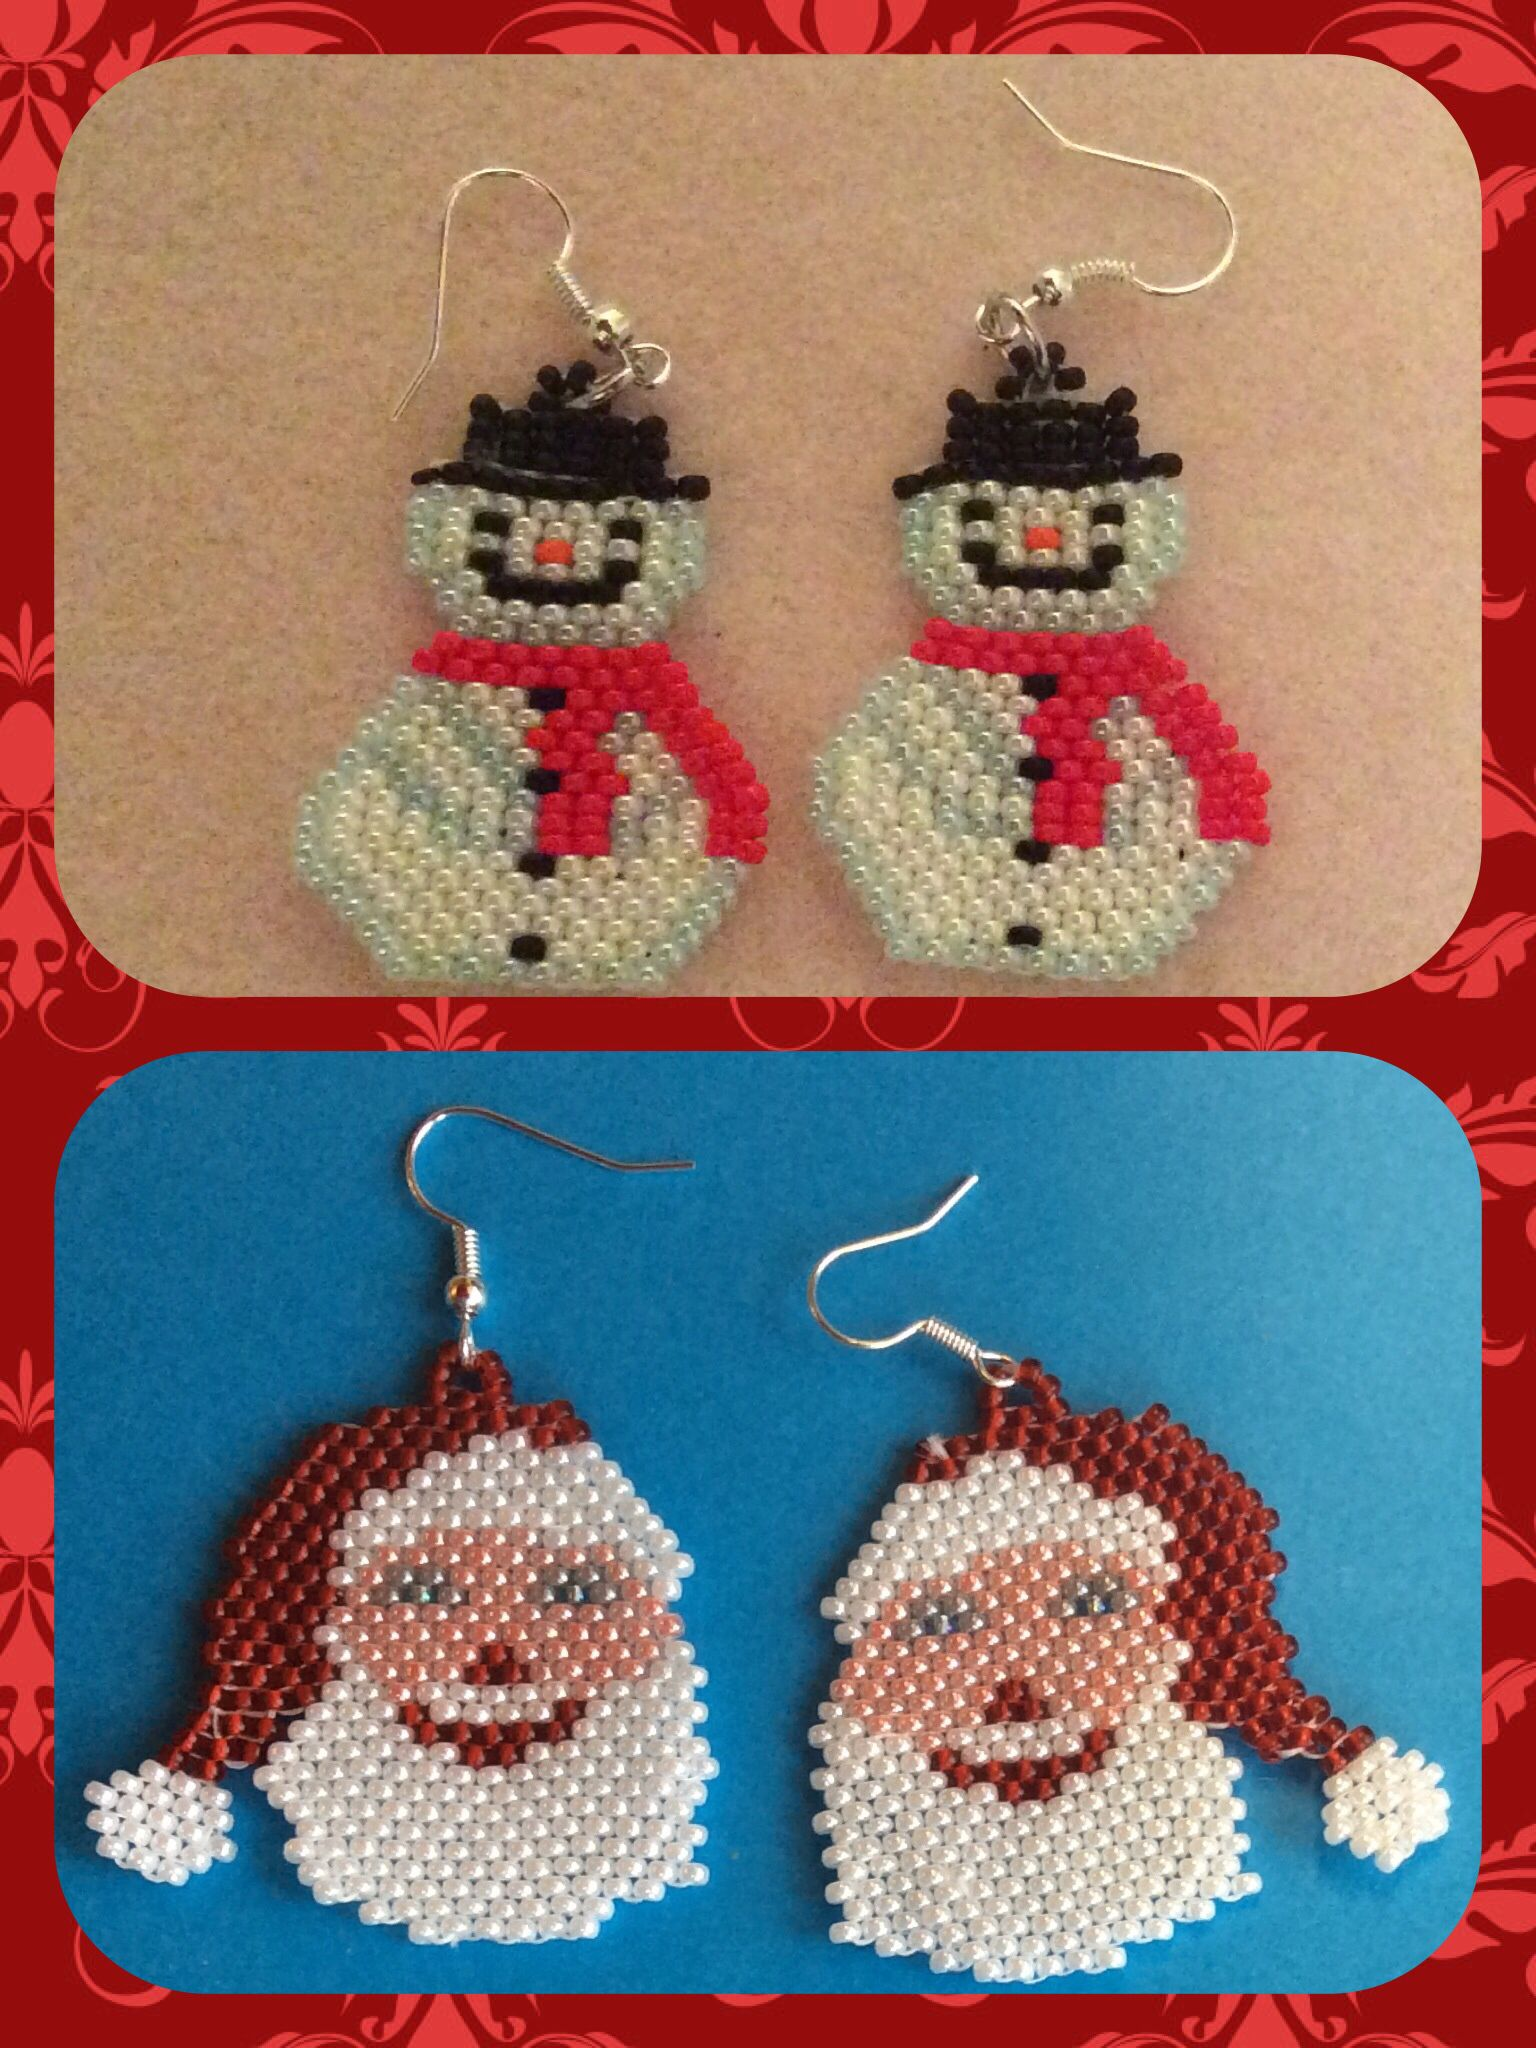 Santa and snowman earrings